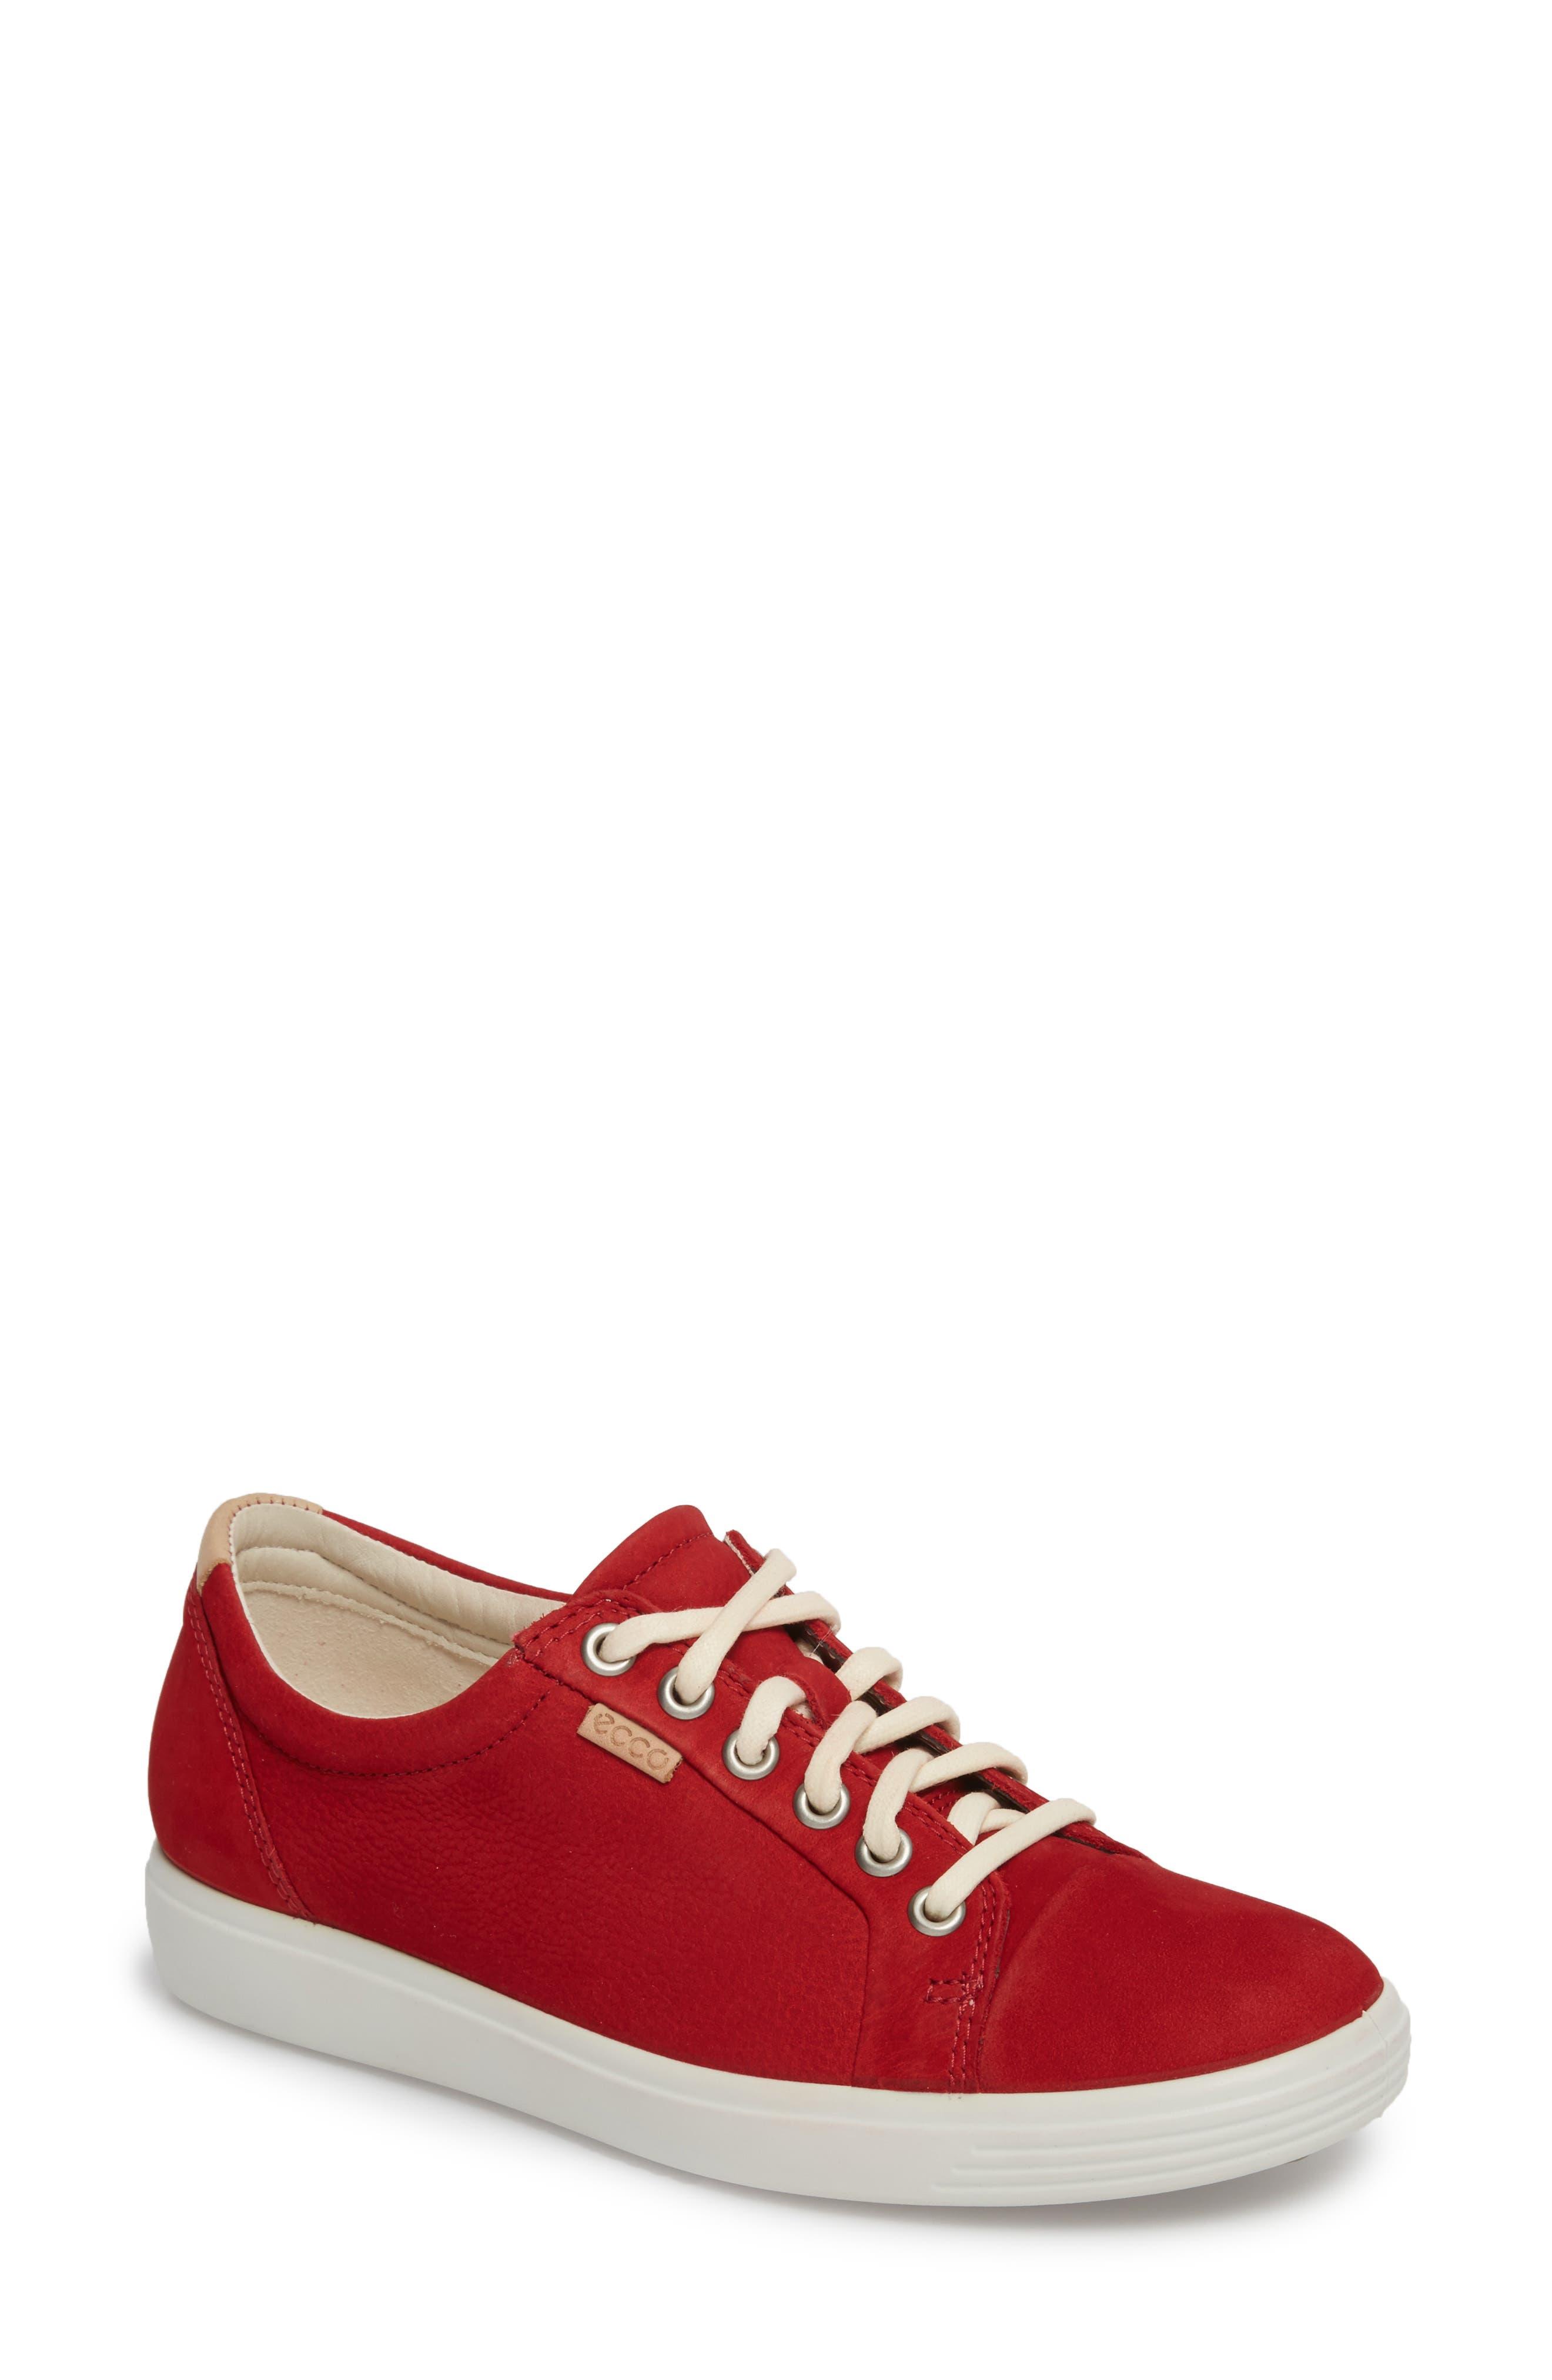 ,                             Soft 7 Sneaker,                             Main thumbnail 118, color,                             603